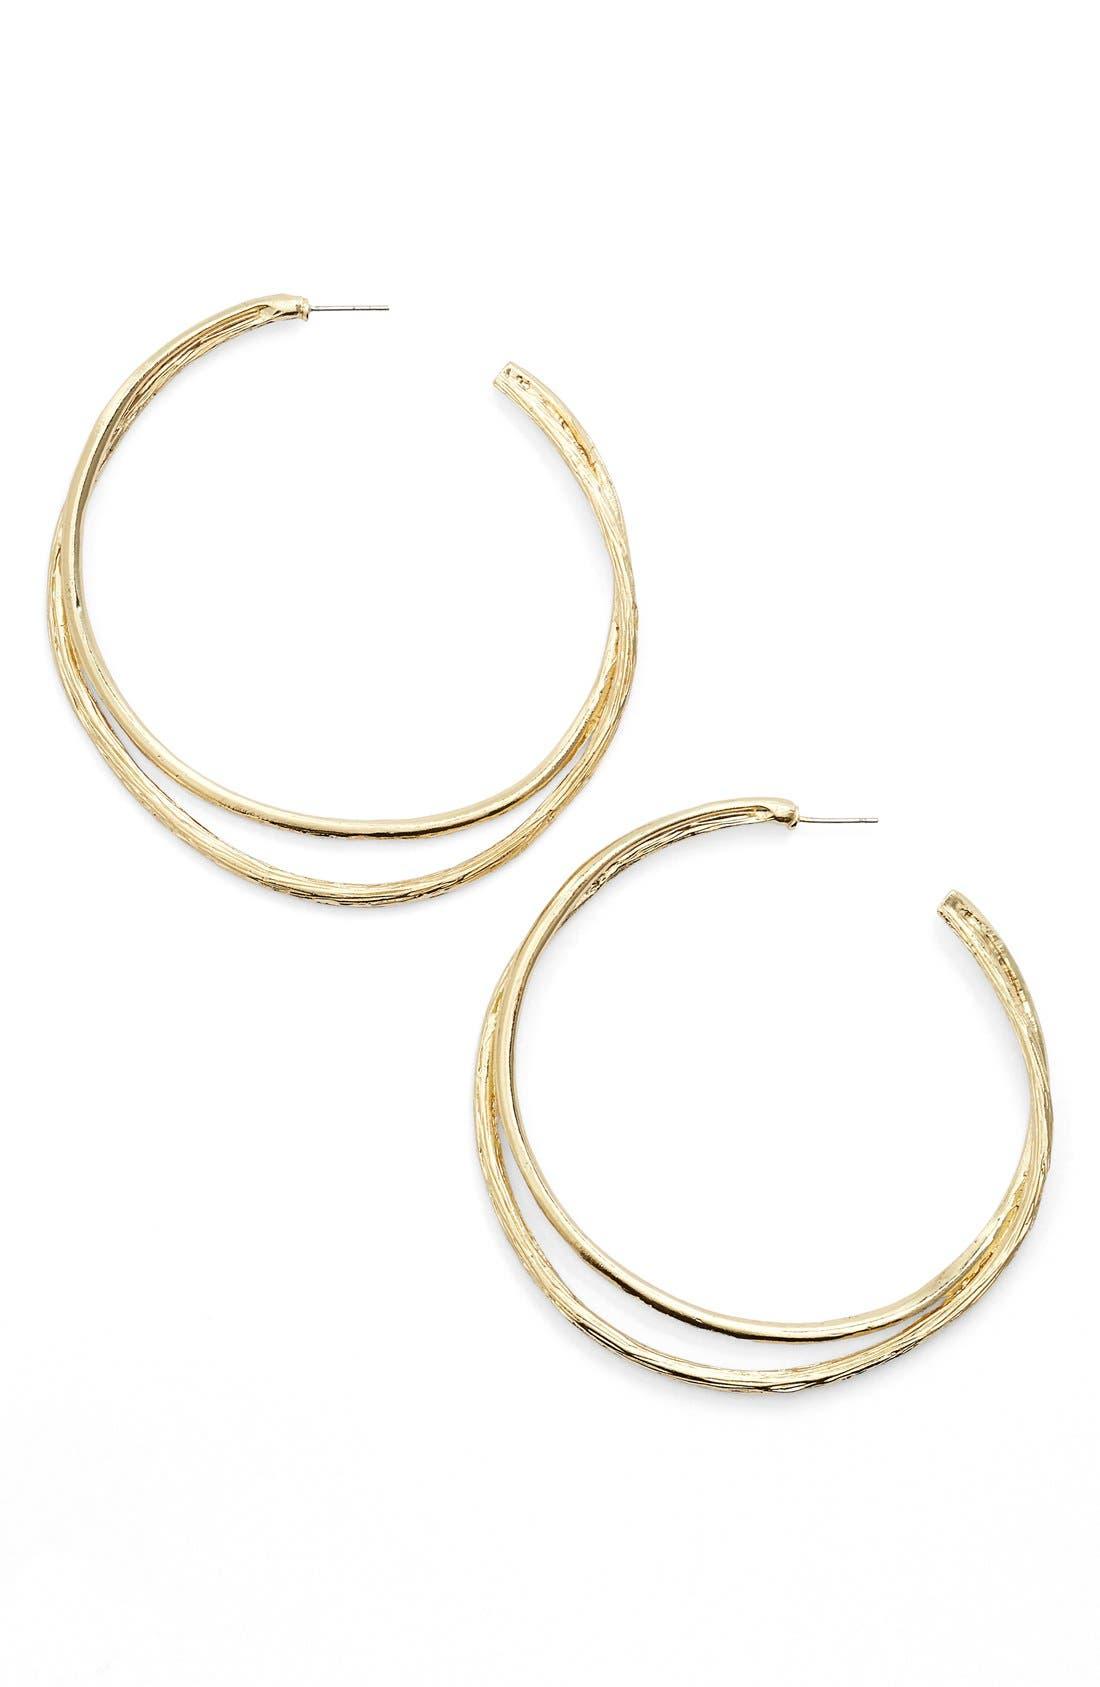 Split Hoop Earrings,                             Main thumbnail 1, color,                             GOLD